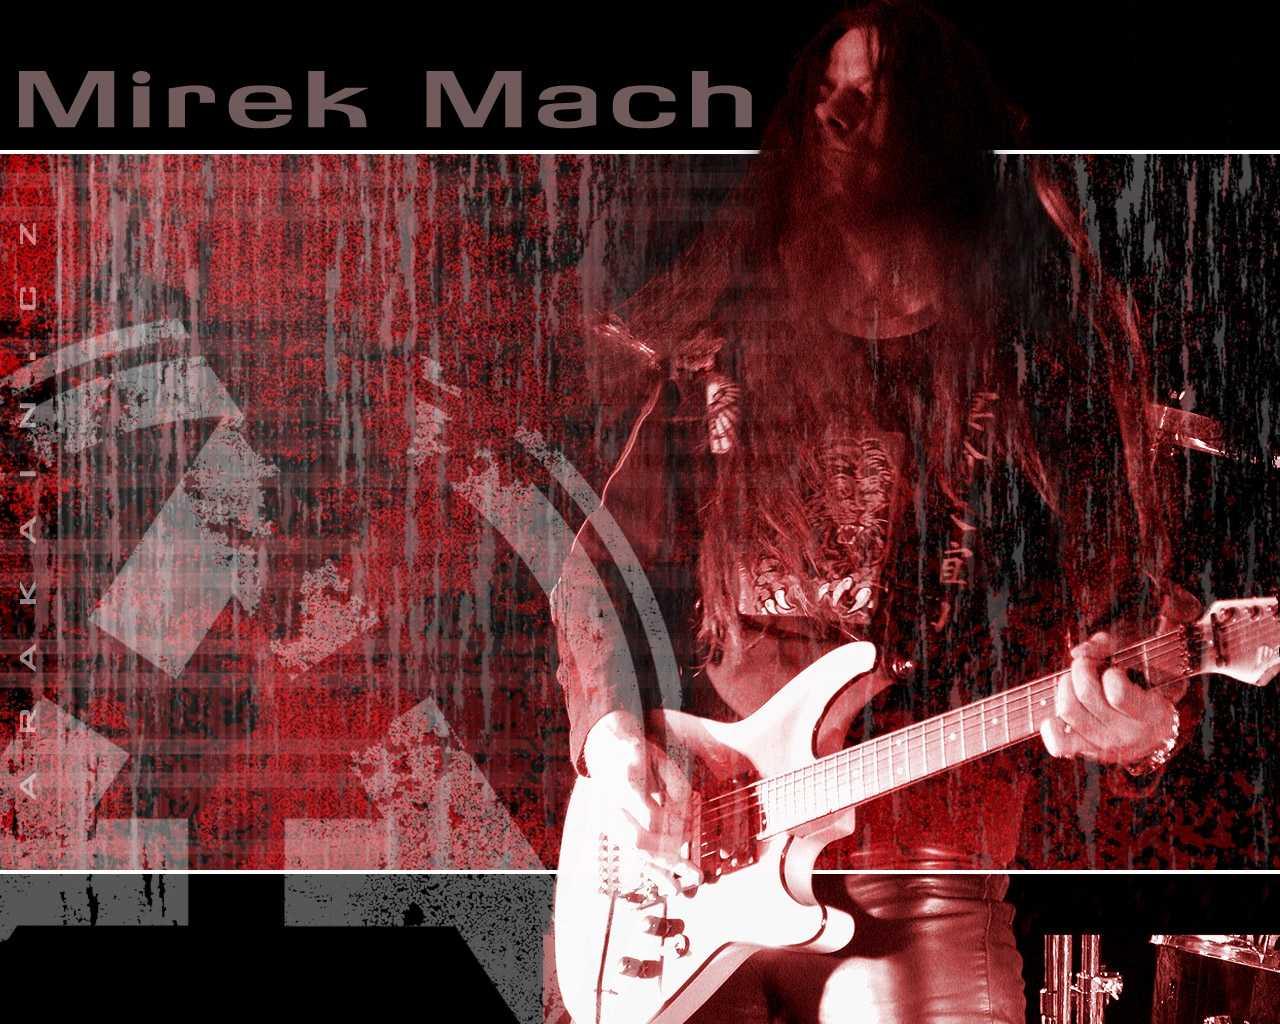 Mirek Mach